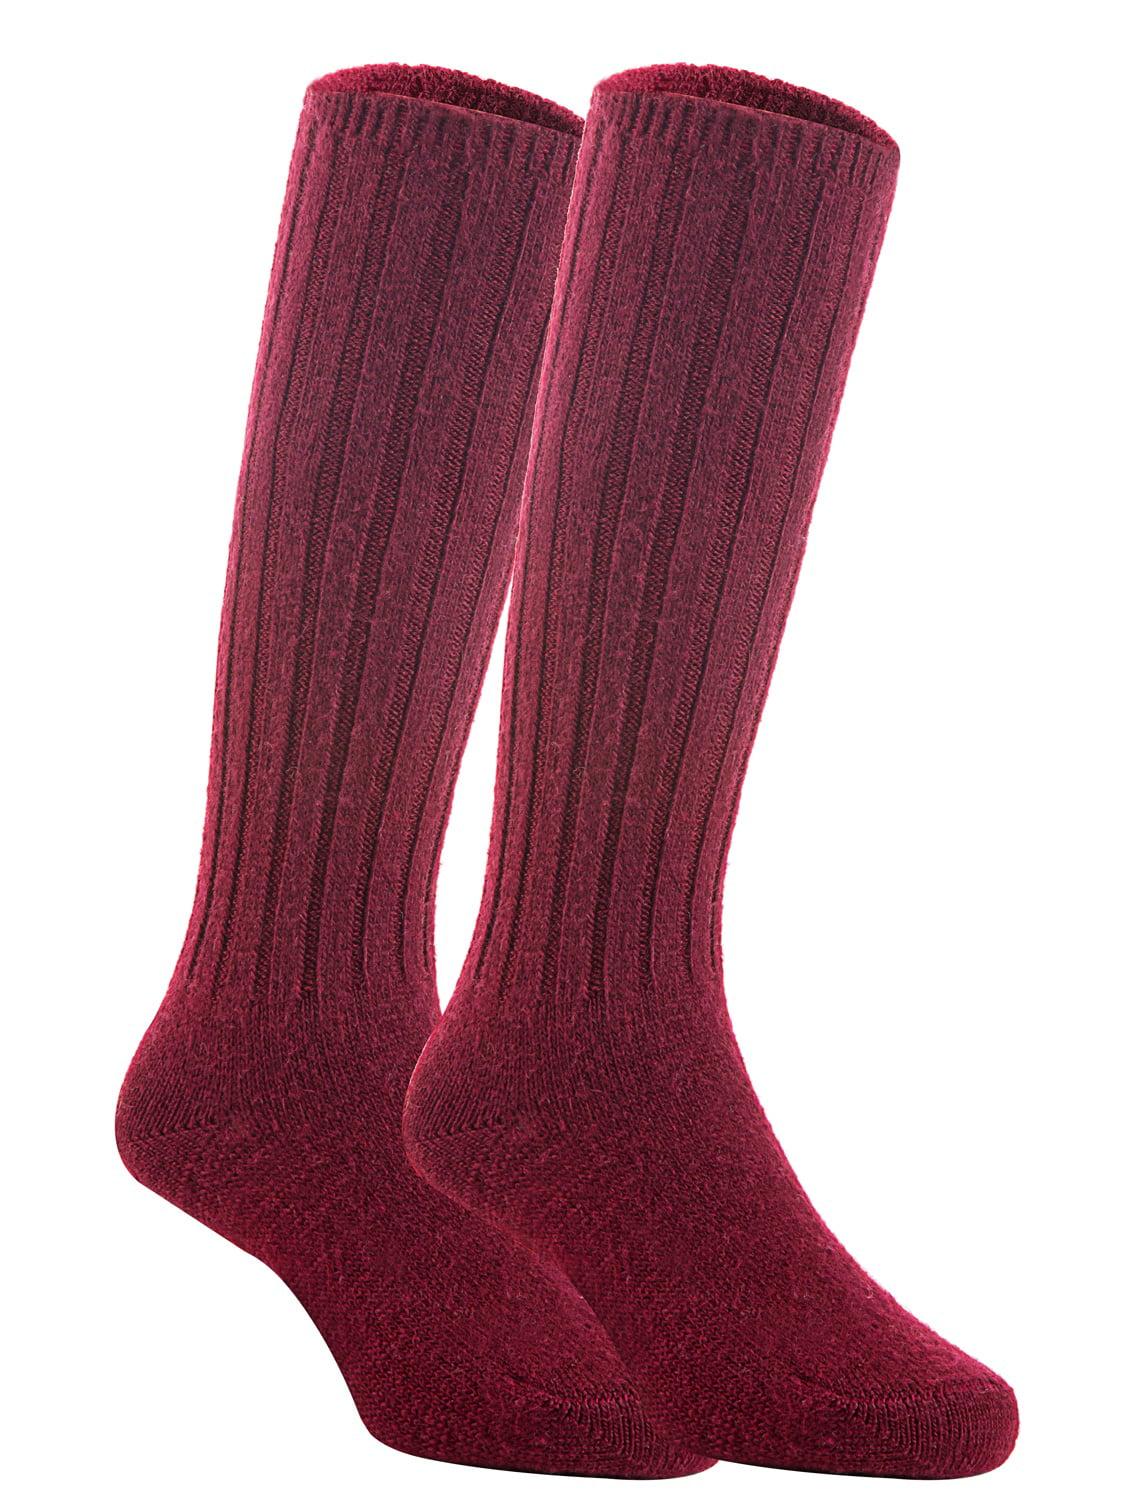 Lian LifeStyle Unisex Baby Children 3 Pairs Knee High Wool Blend Boot Socks Size 2-4Y  (Wine)